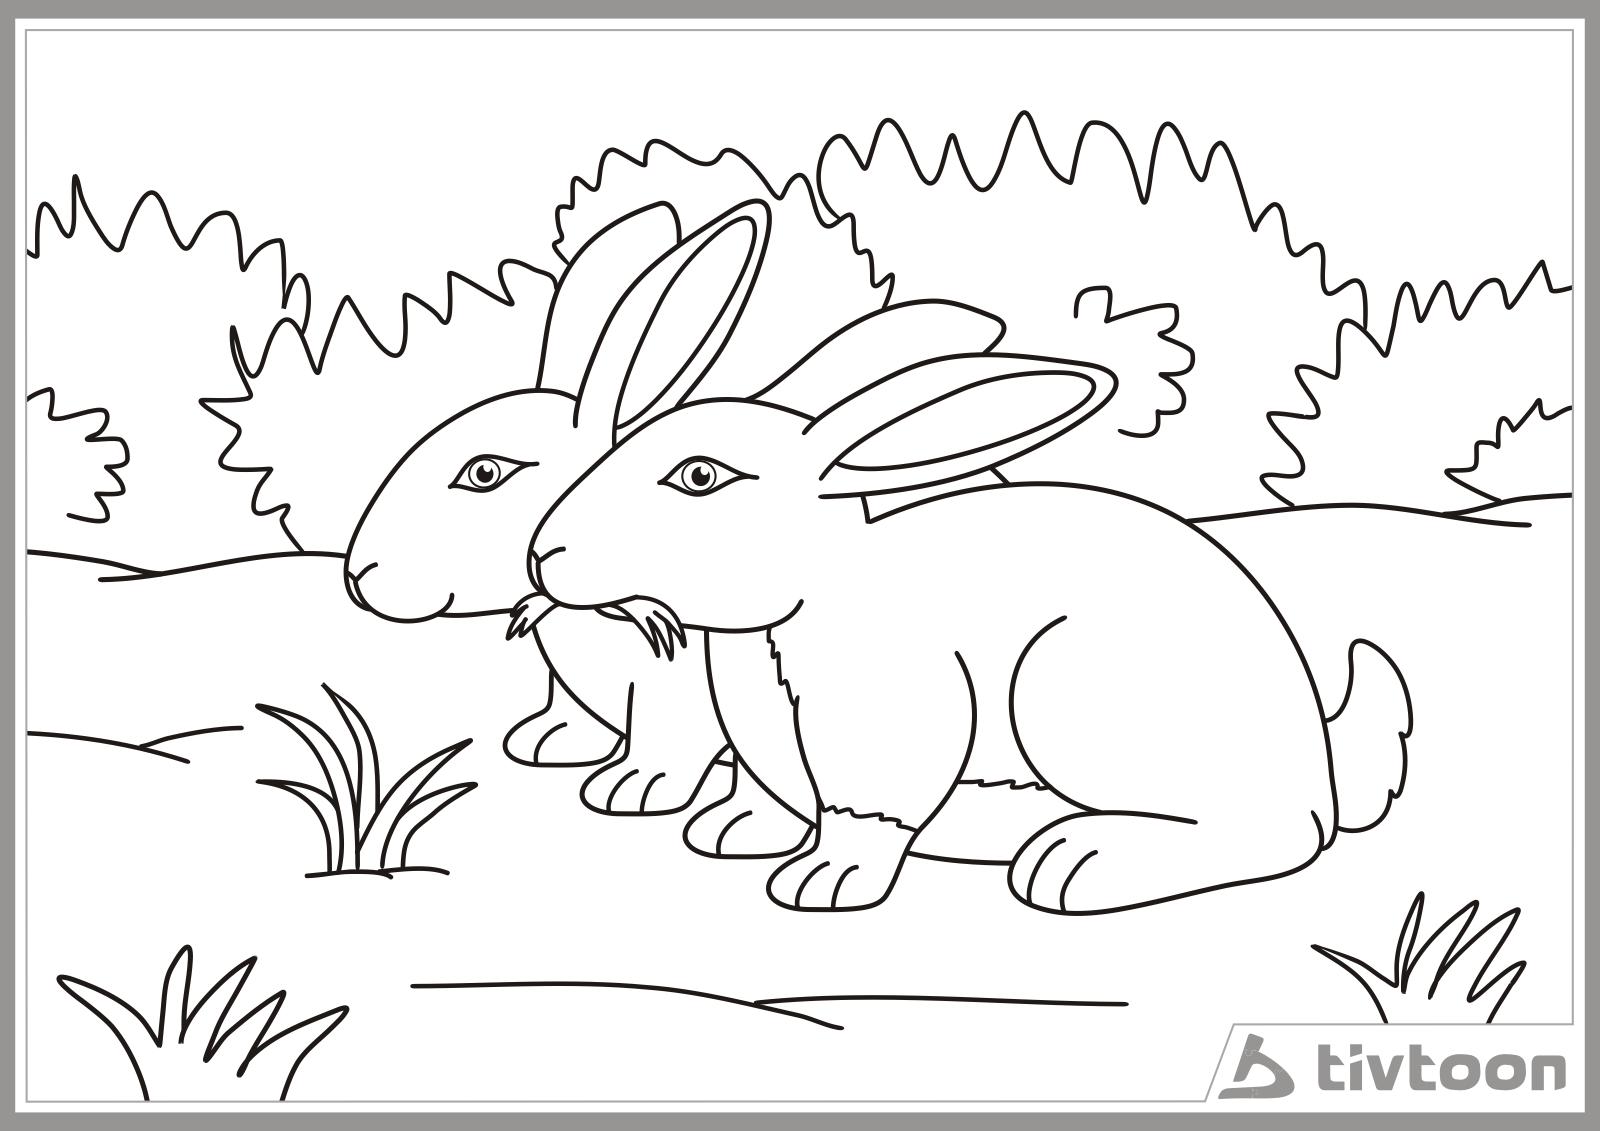 Contoh Gambar Ilustrasi Kelinci